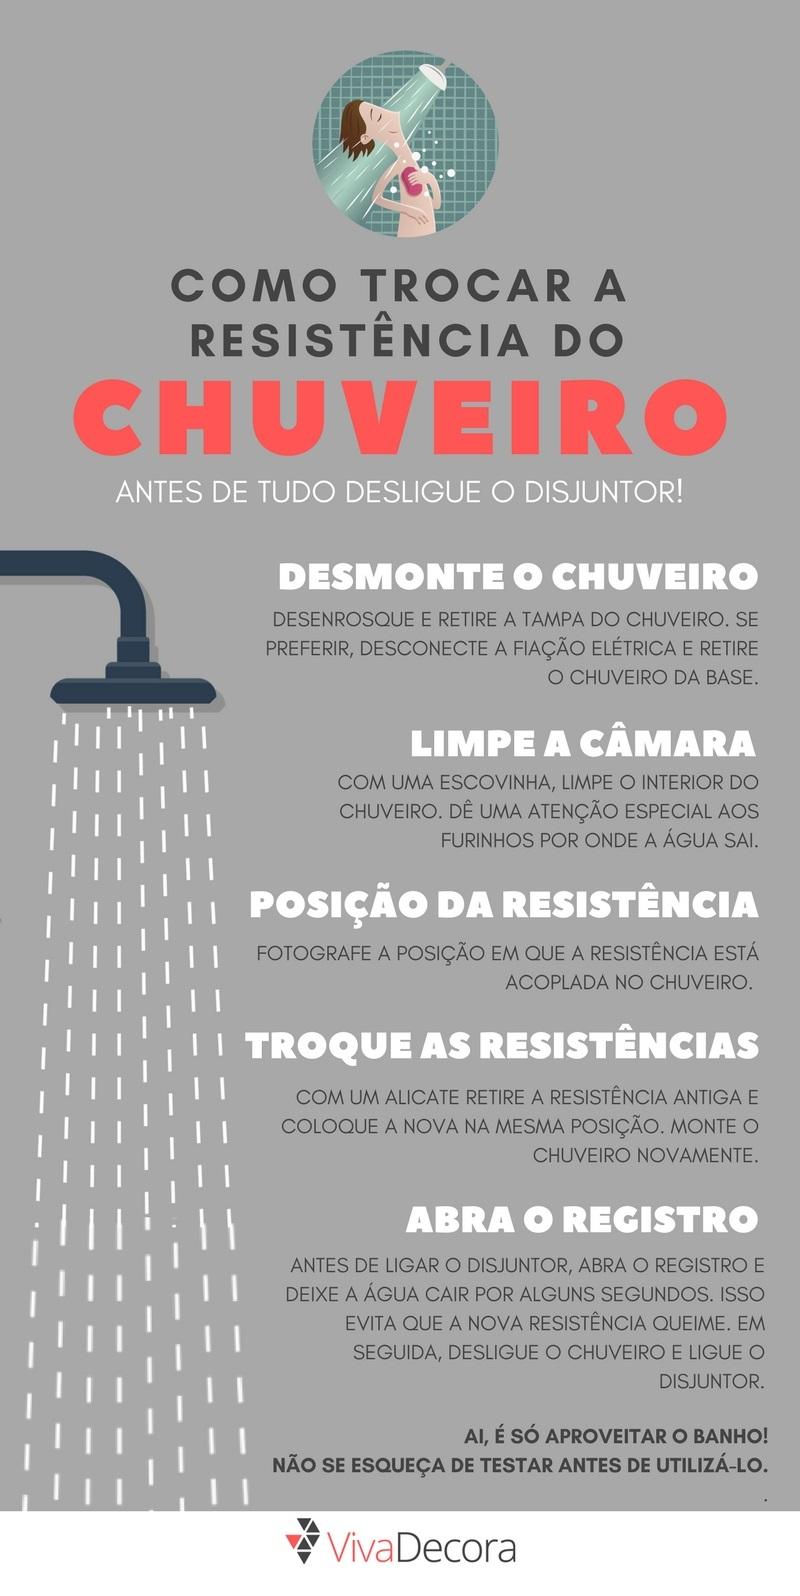 Como trocar resistência do chuveiro